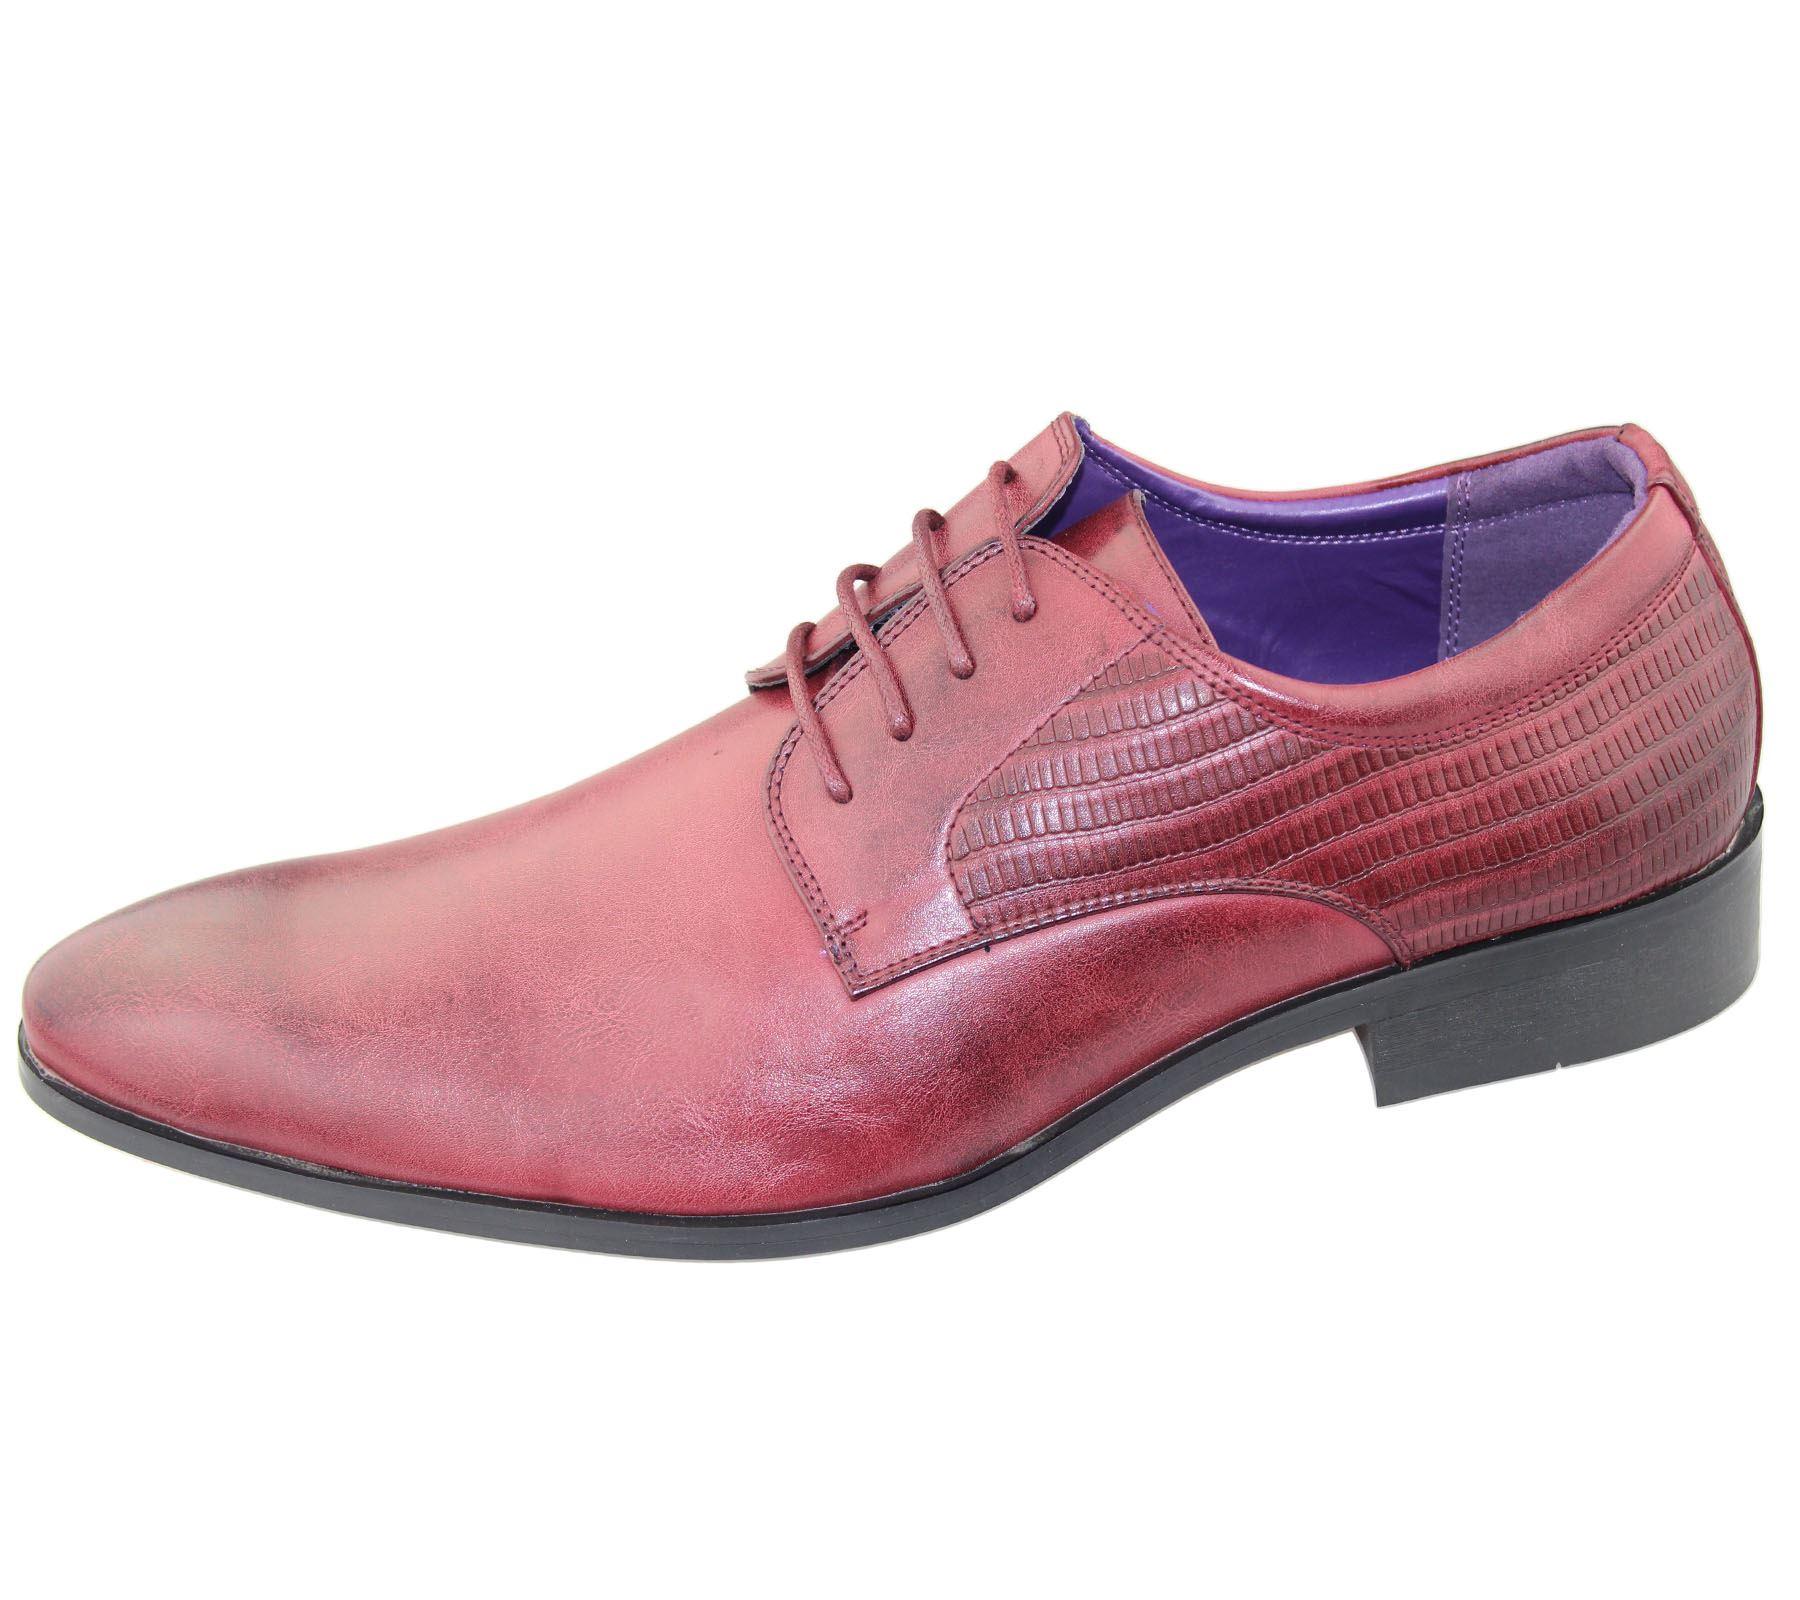 Mens Brogues Shoes fice Casual Wedding Formal Smart